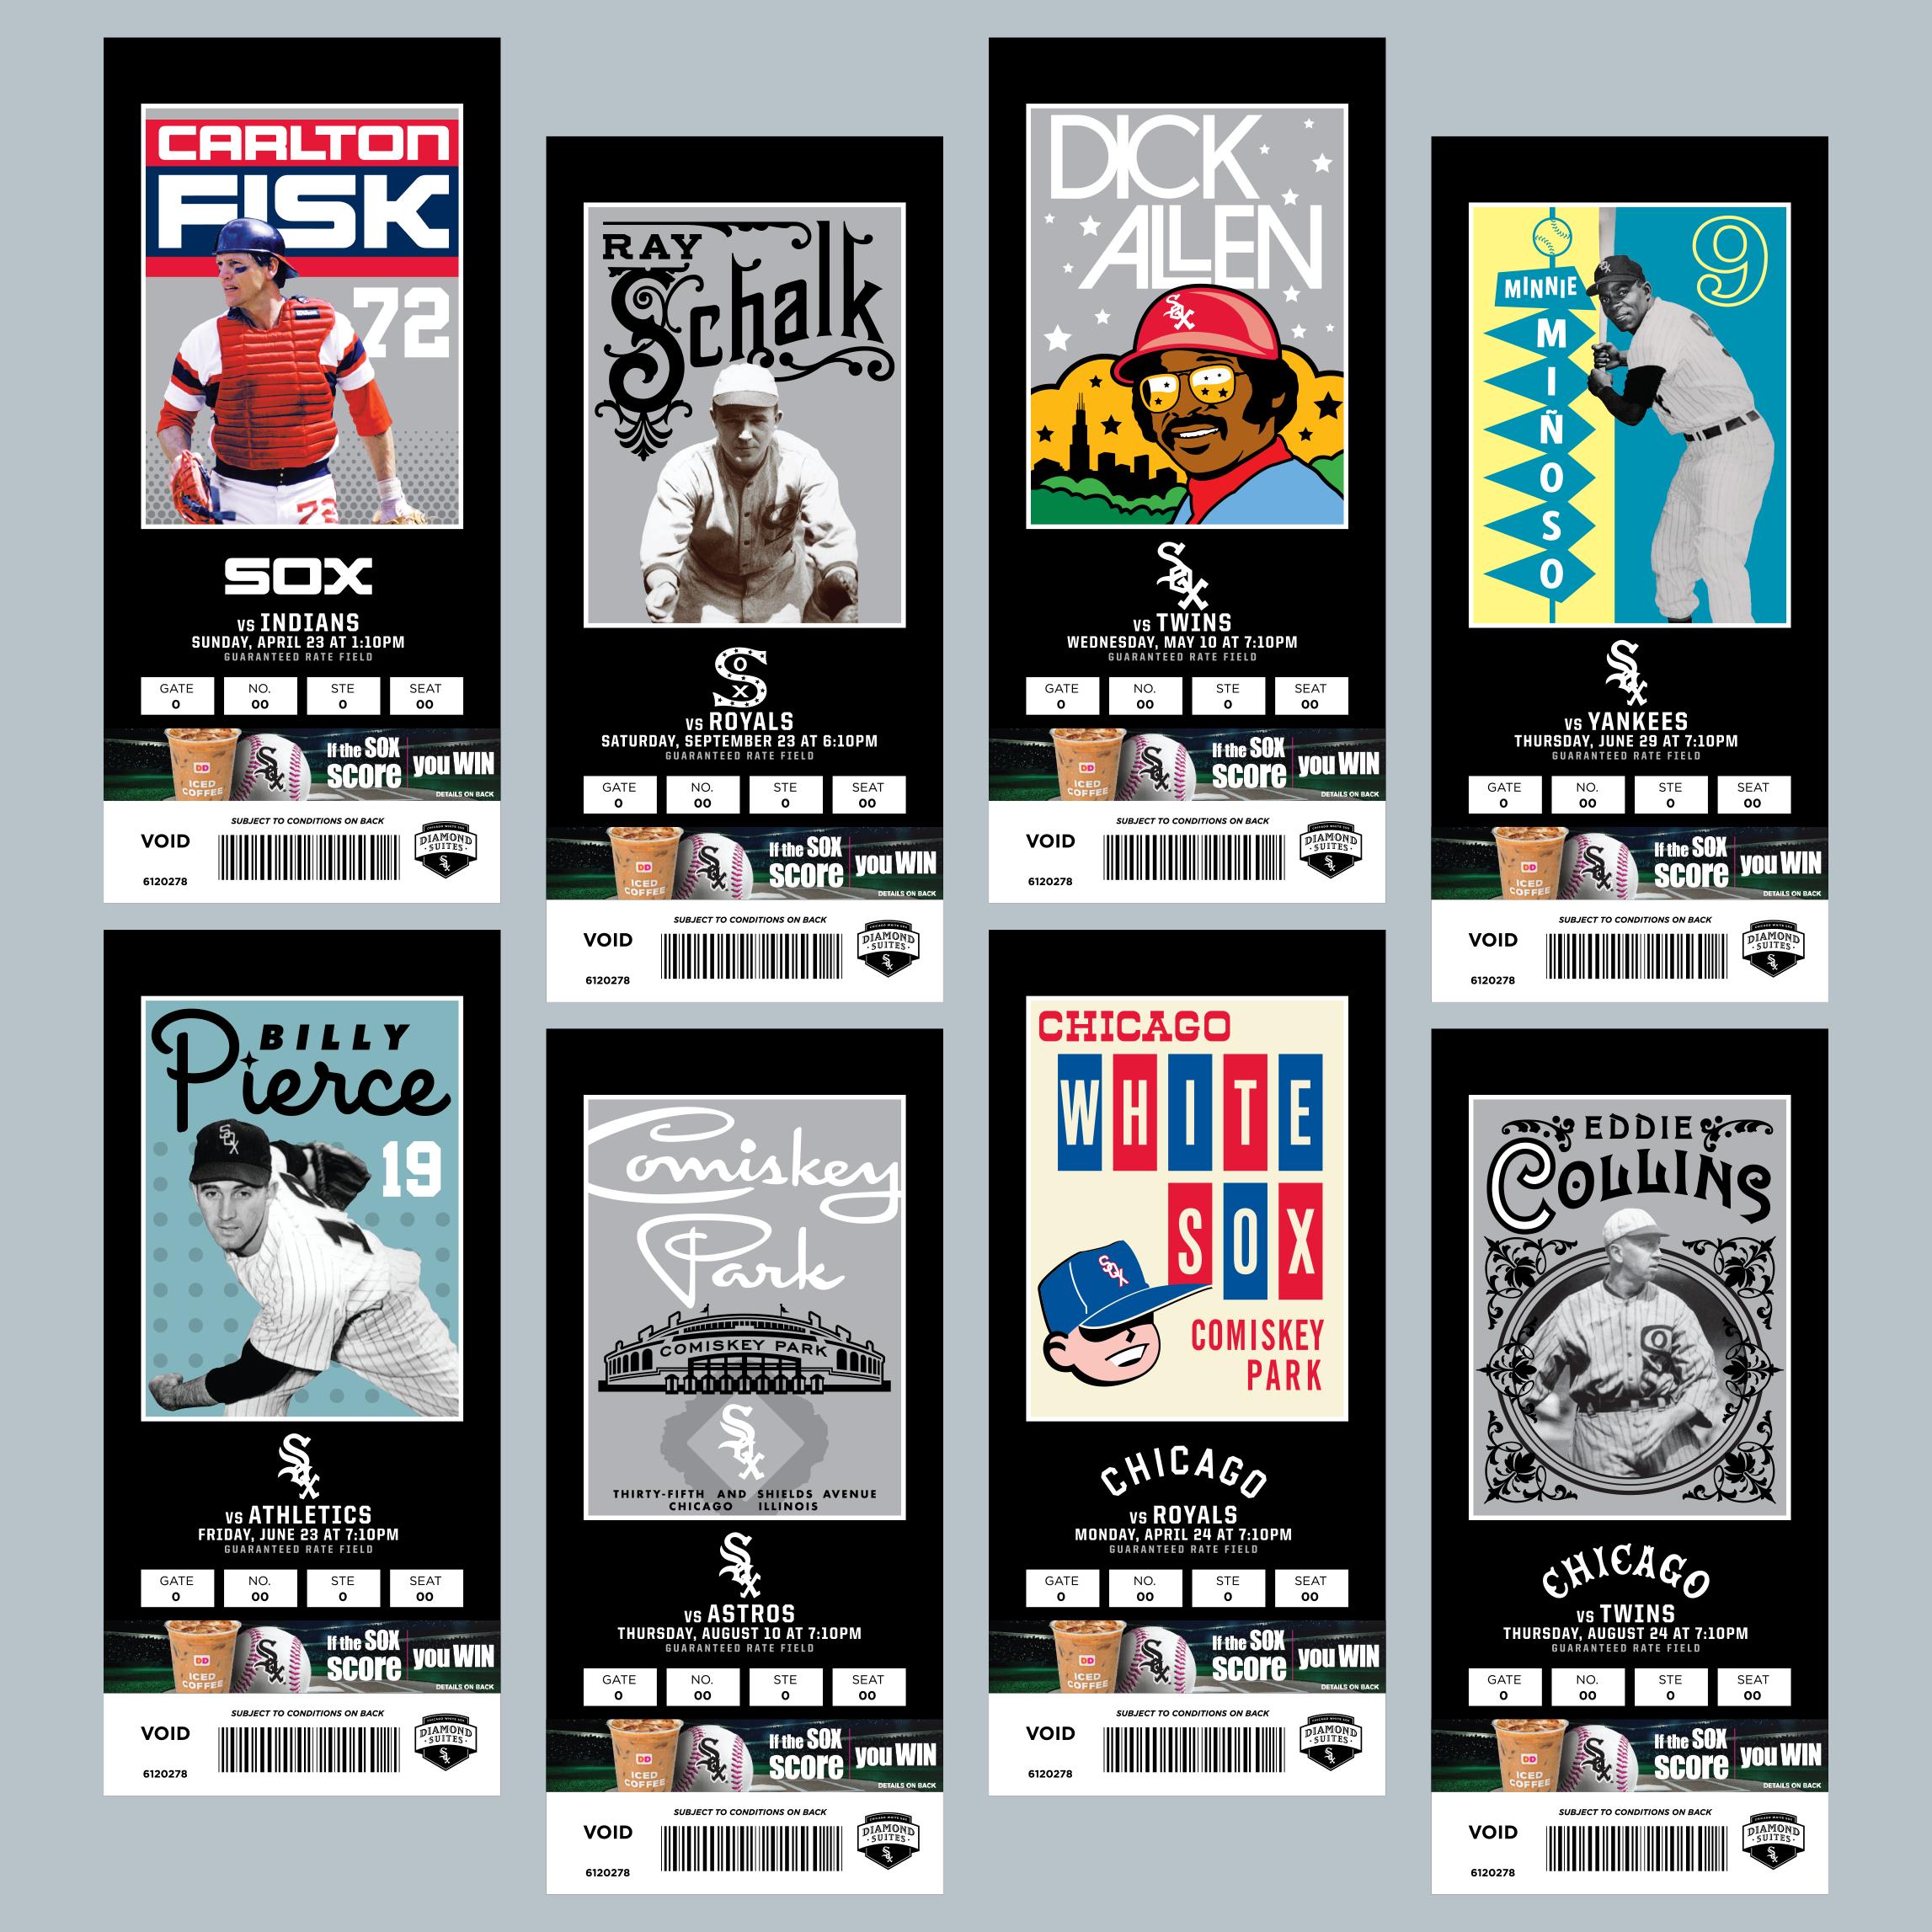 White Sox Premium Season Tickets -